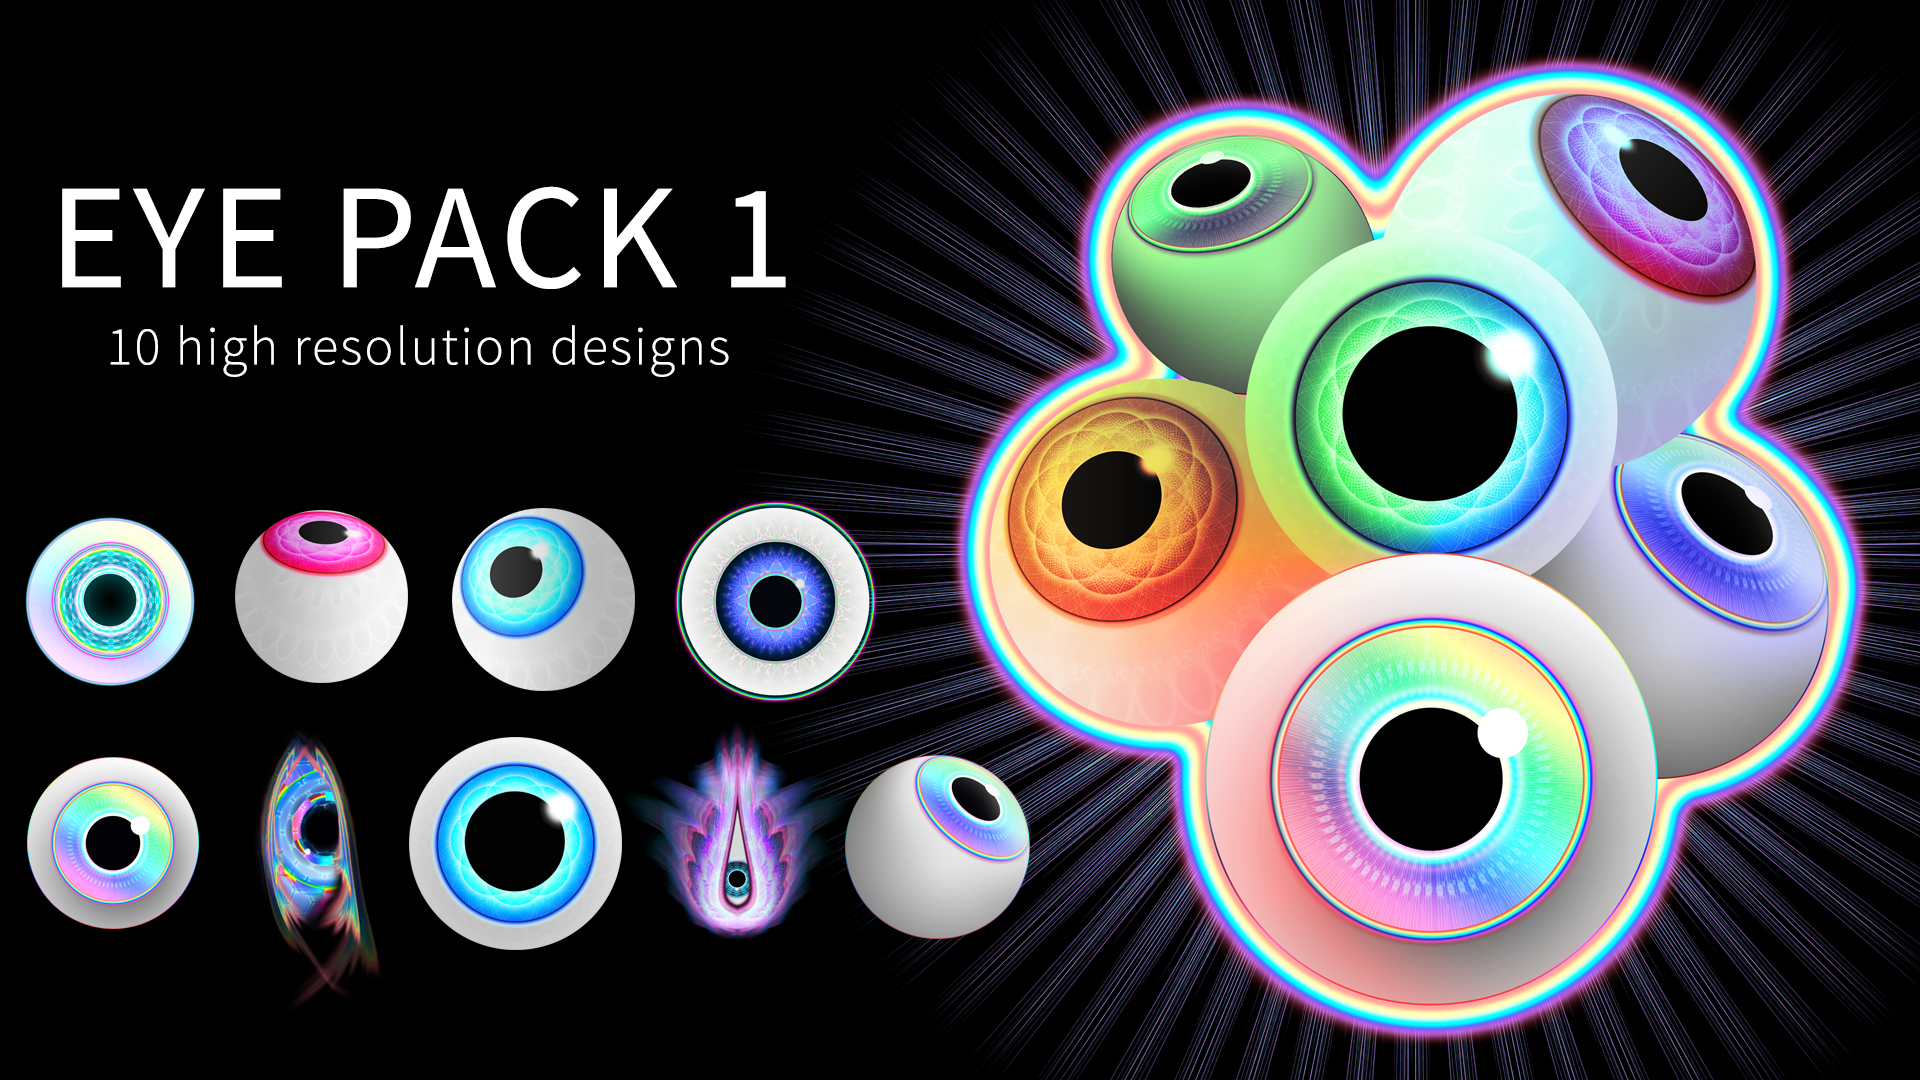 Eye pack 1